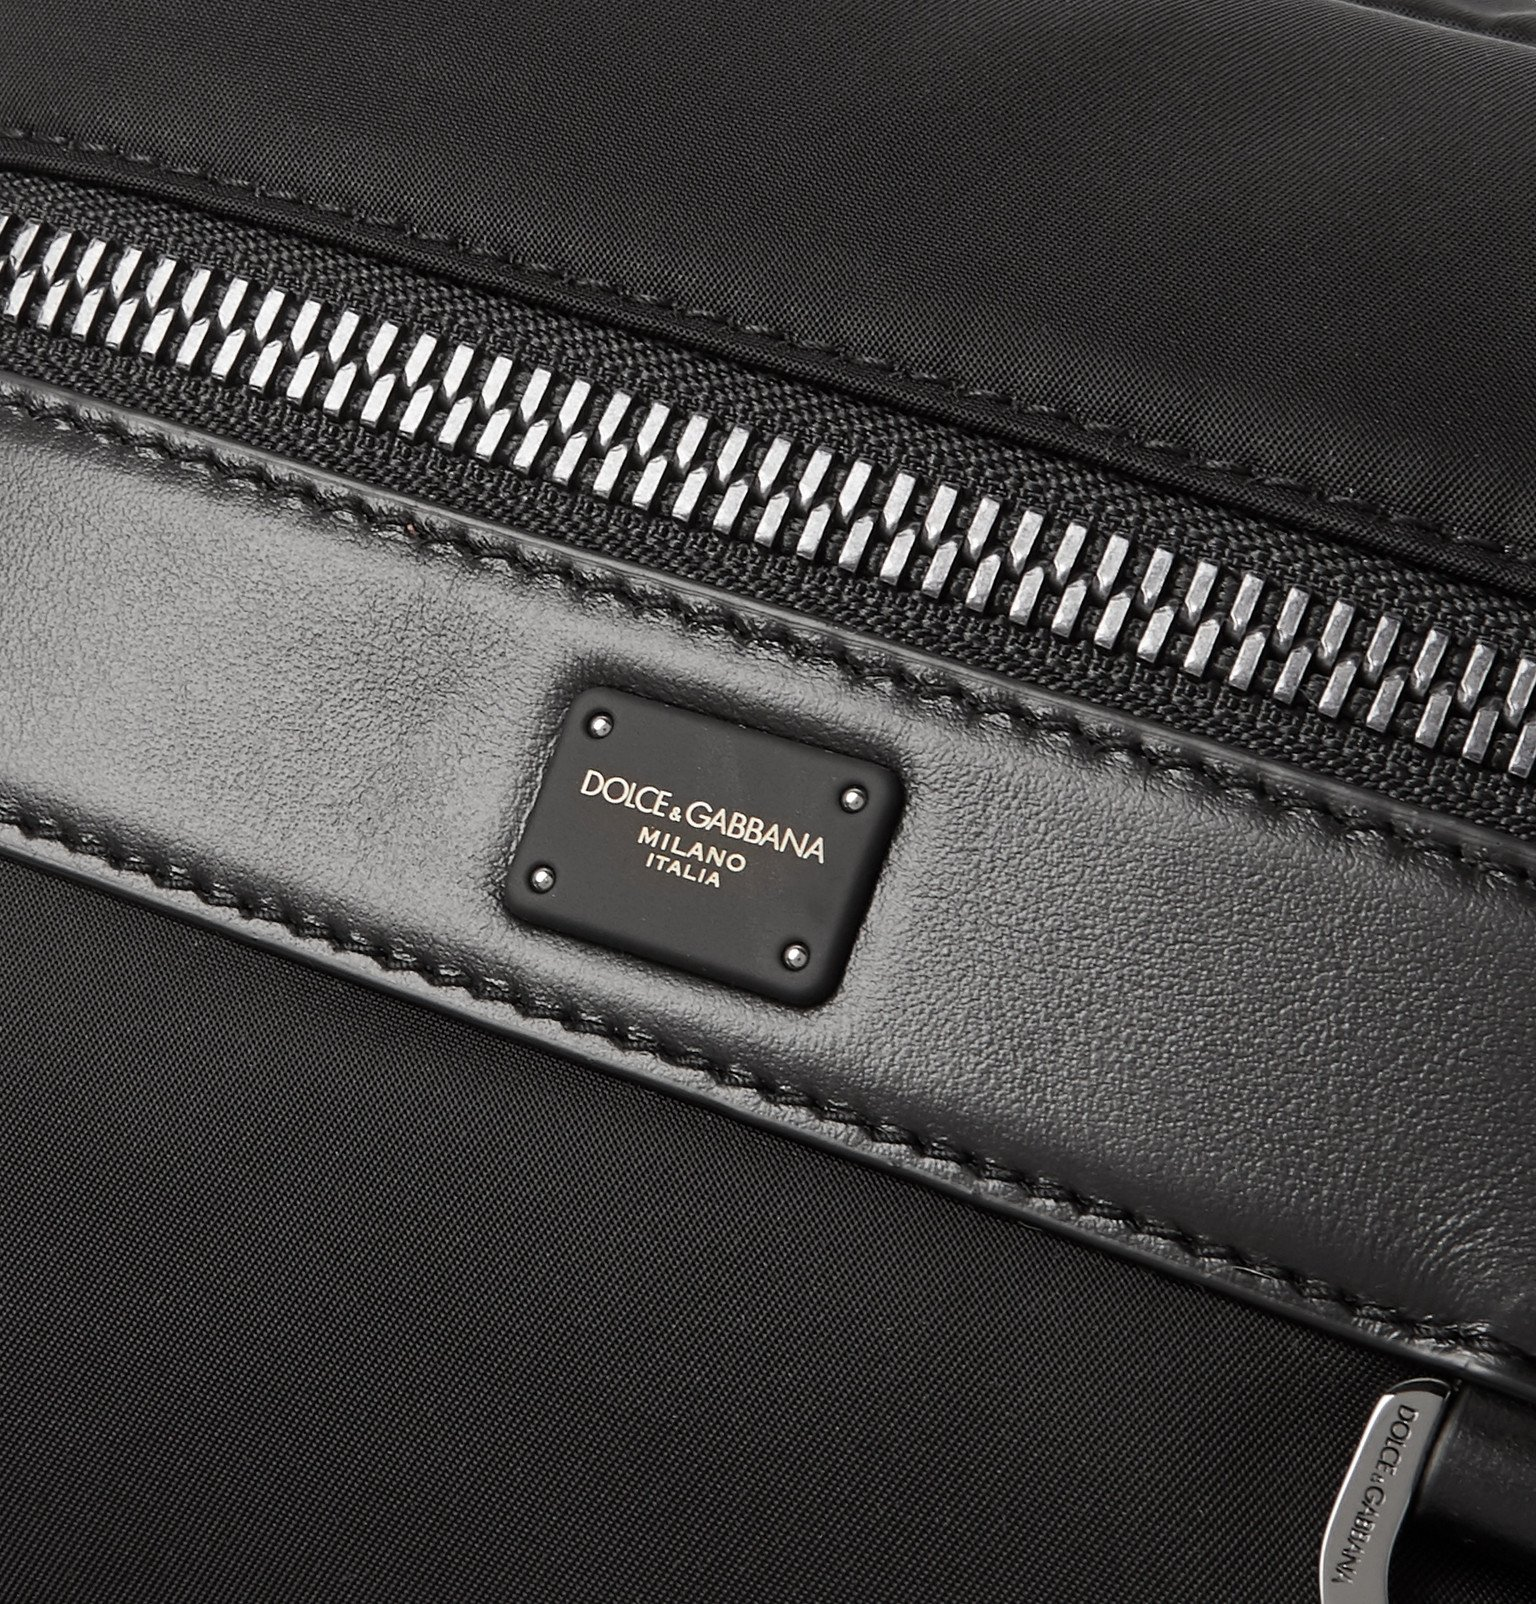 Dolce & Gabbana - Convertible Logo-Detailed Leather-Trimmed Nylon Bag - Black